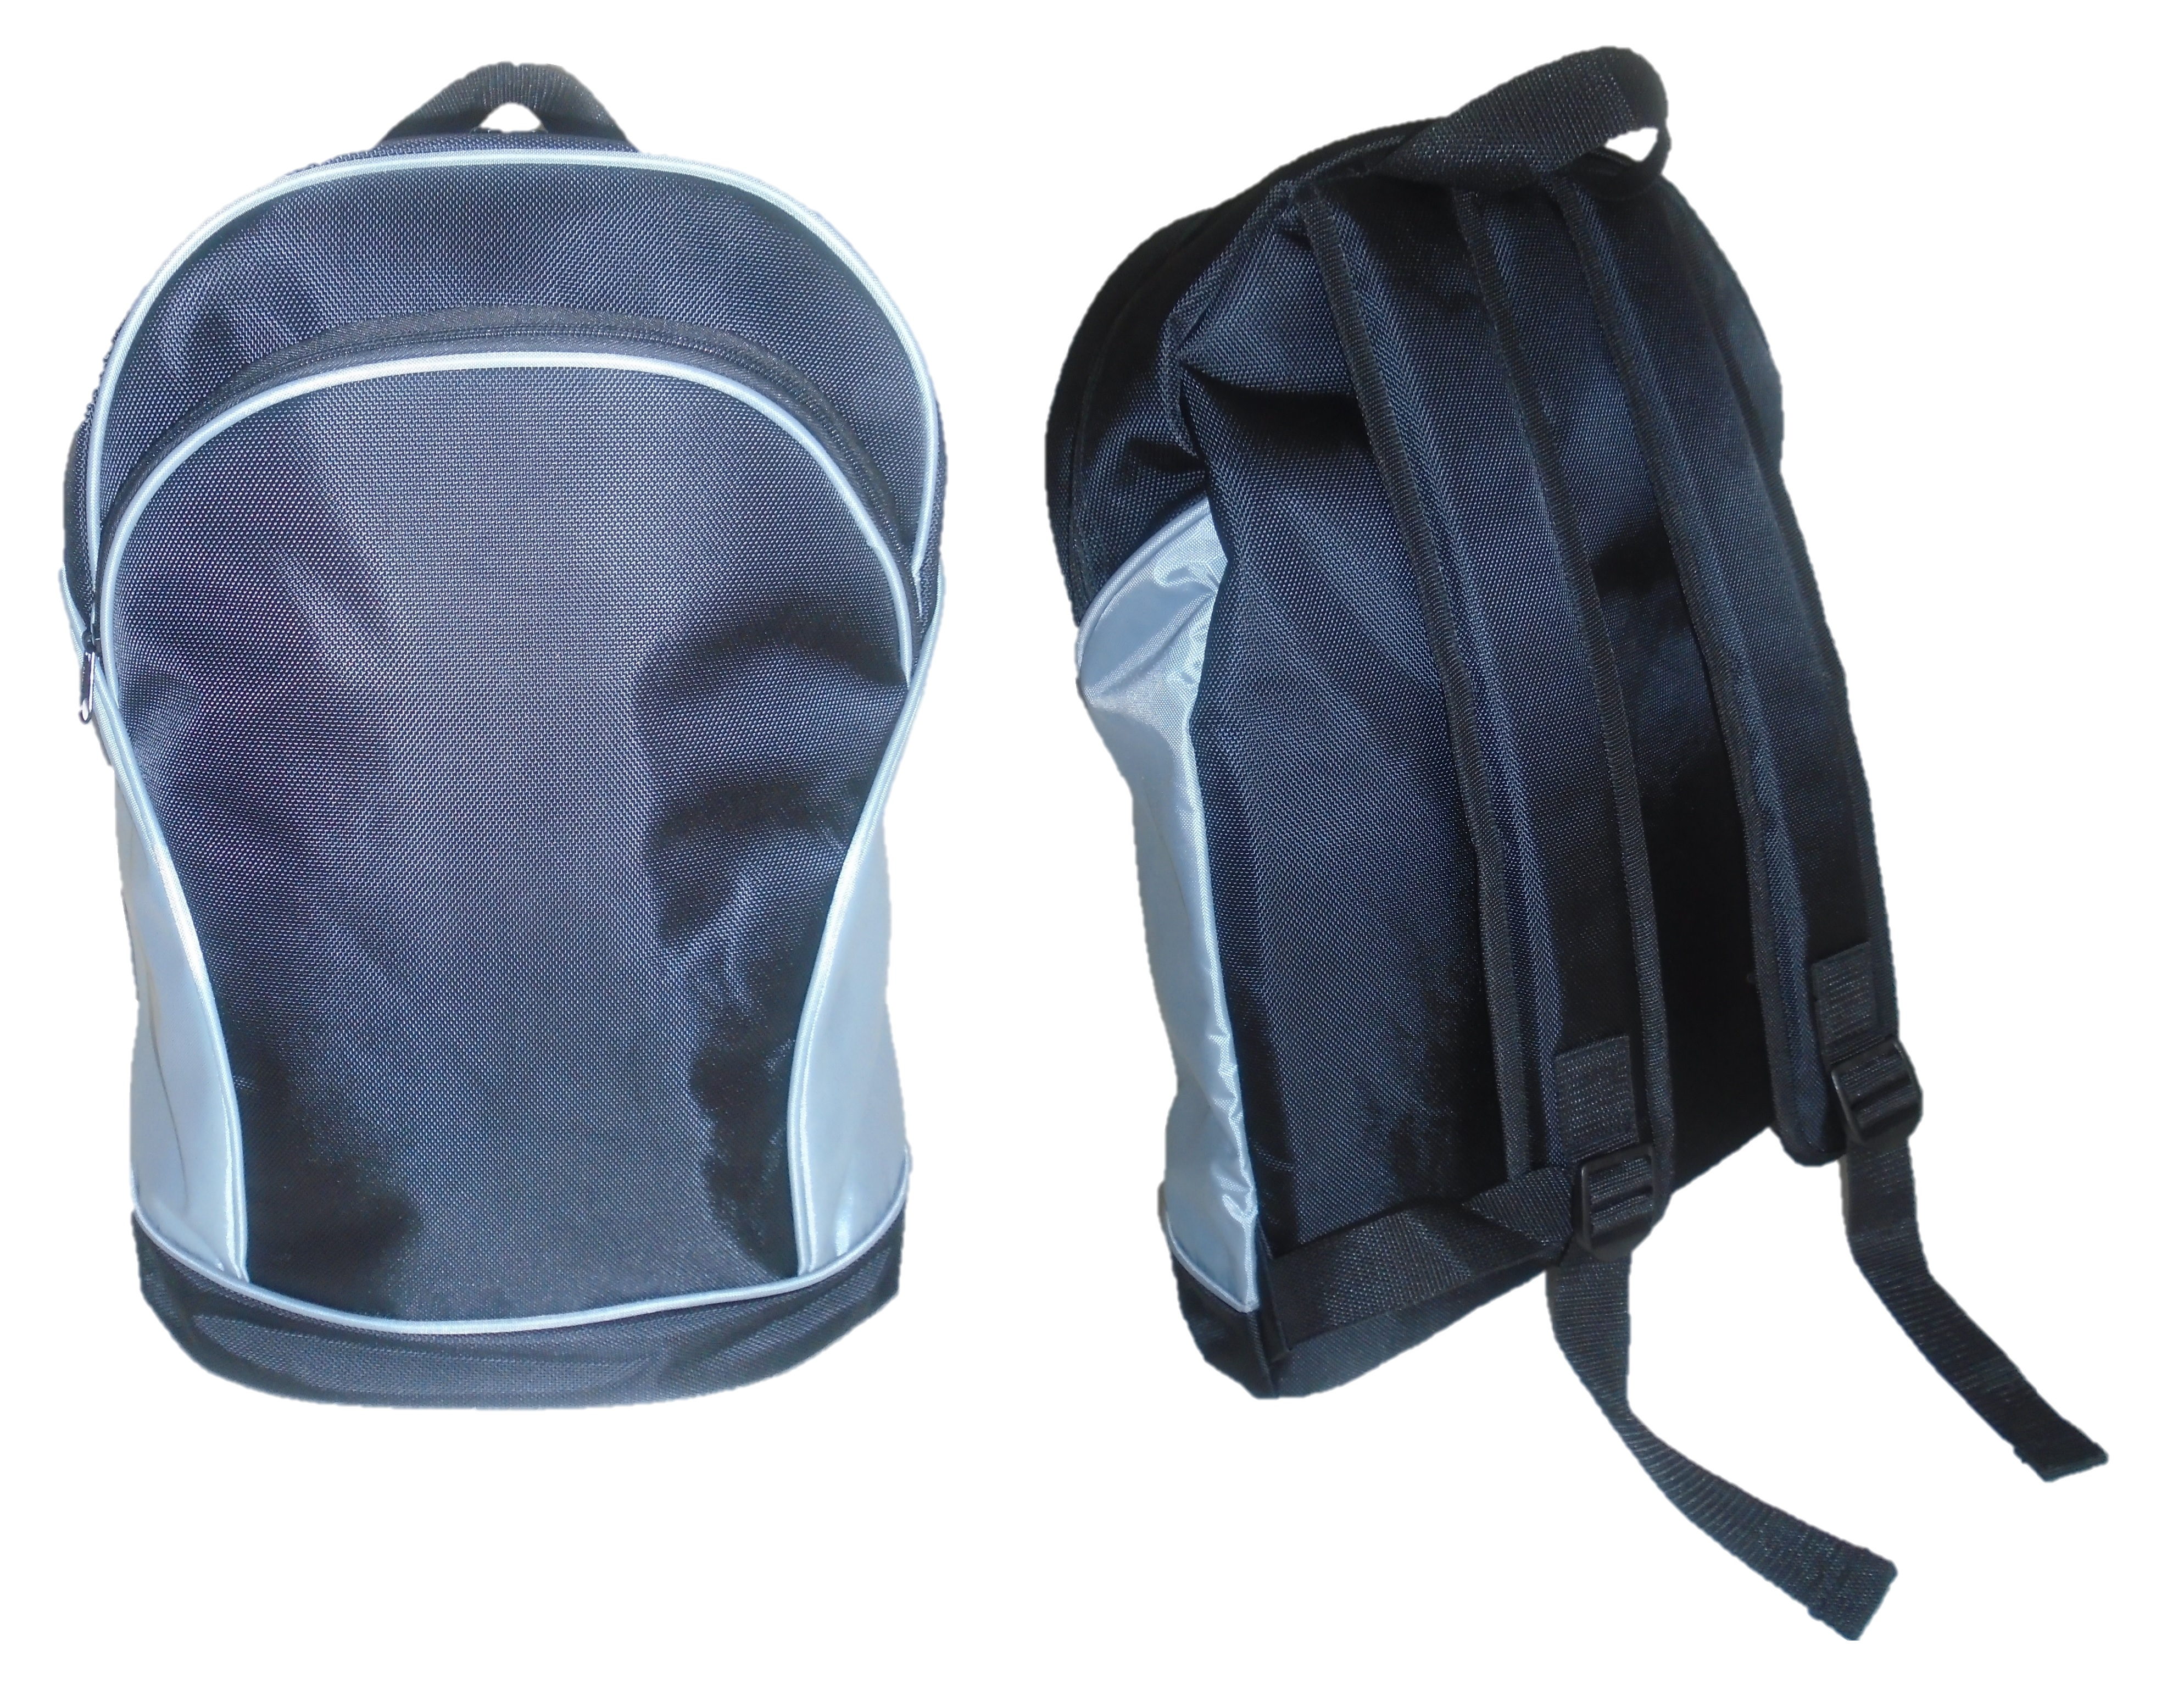 Backpack Bag-(YPBP0004)